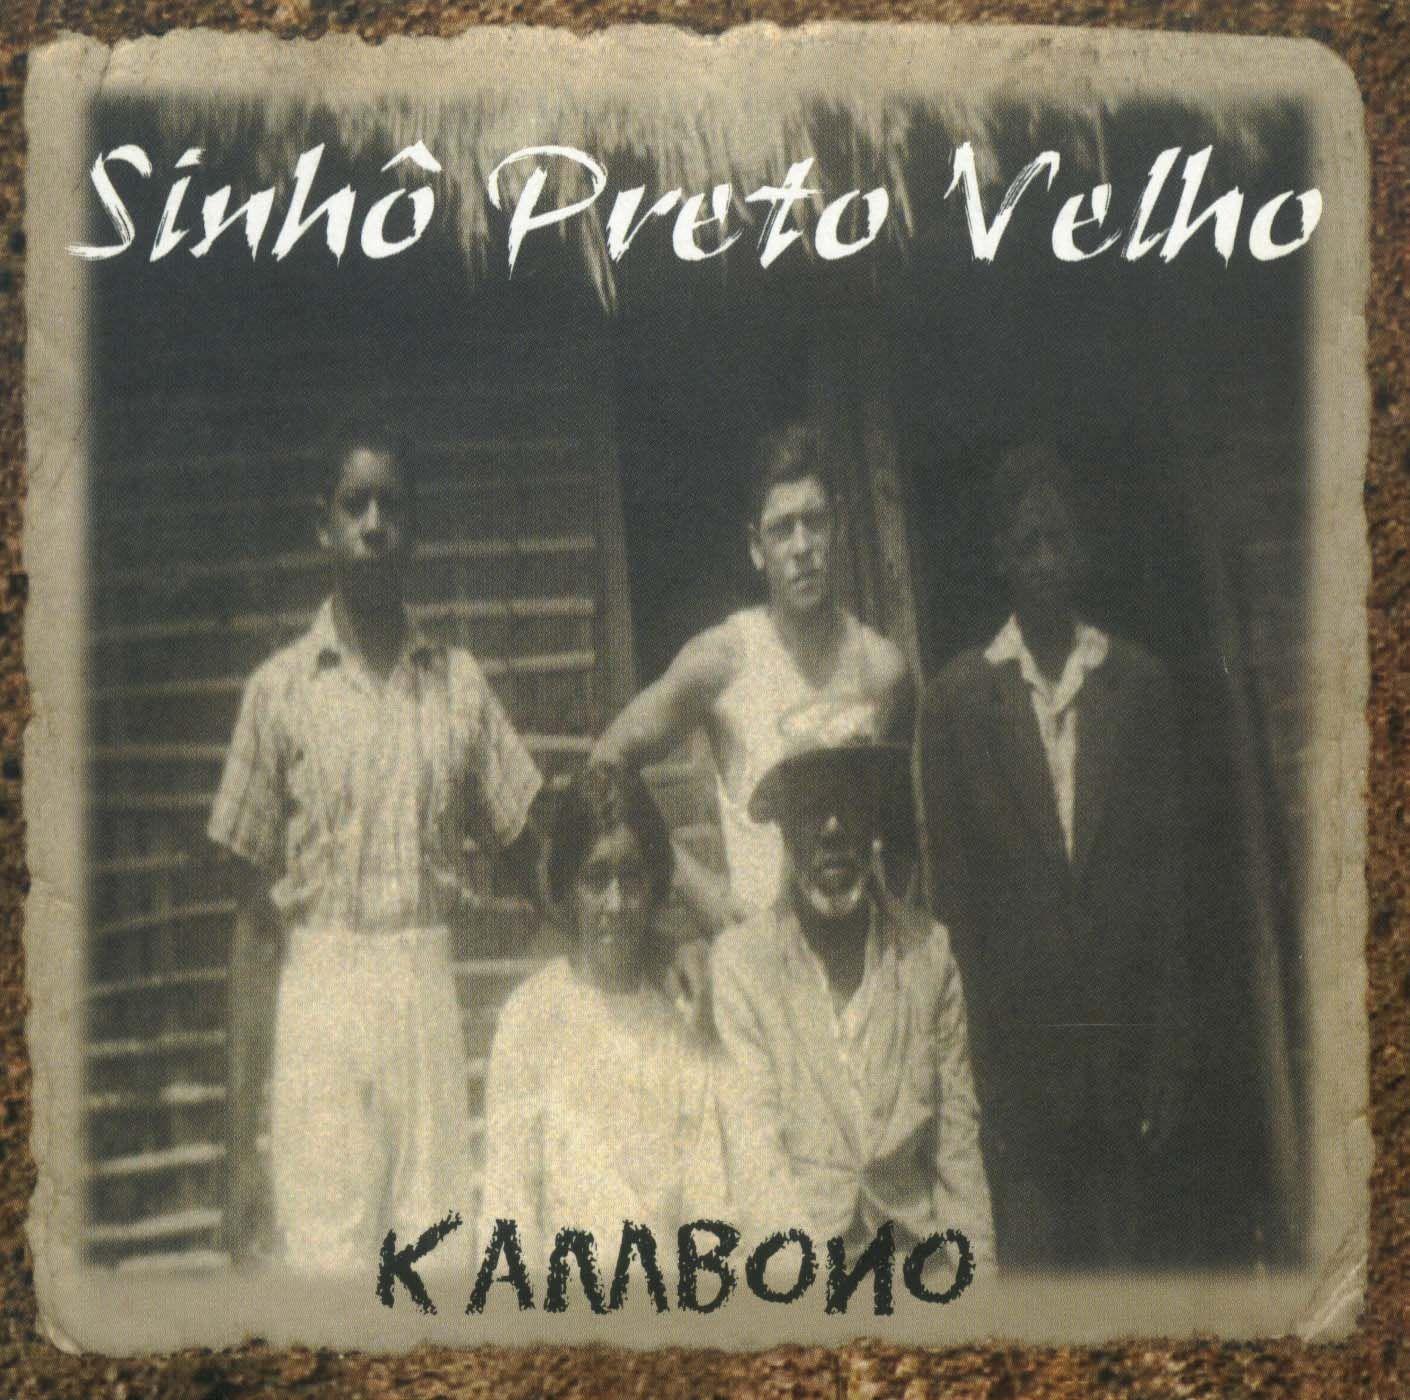 Capa do CD Kambono, de Sinhô Preto Velho